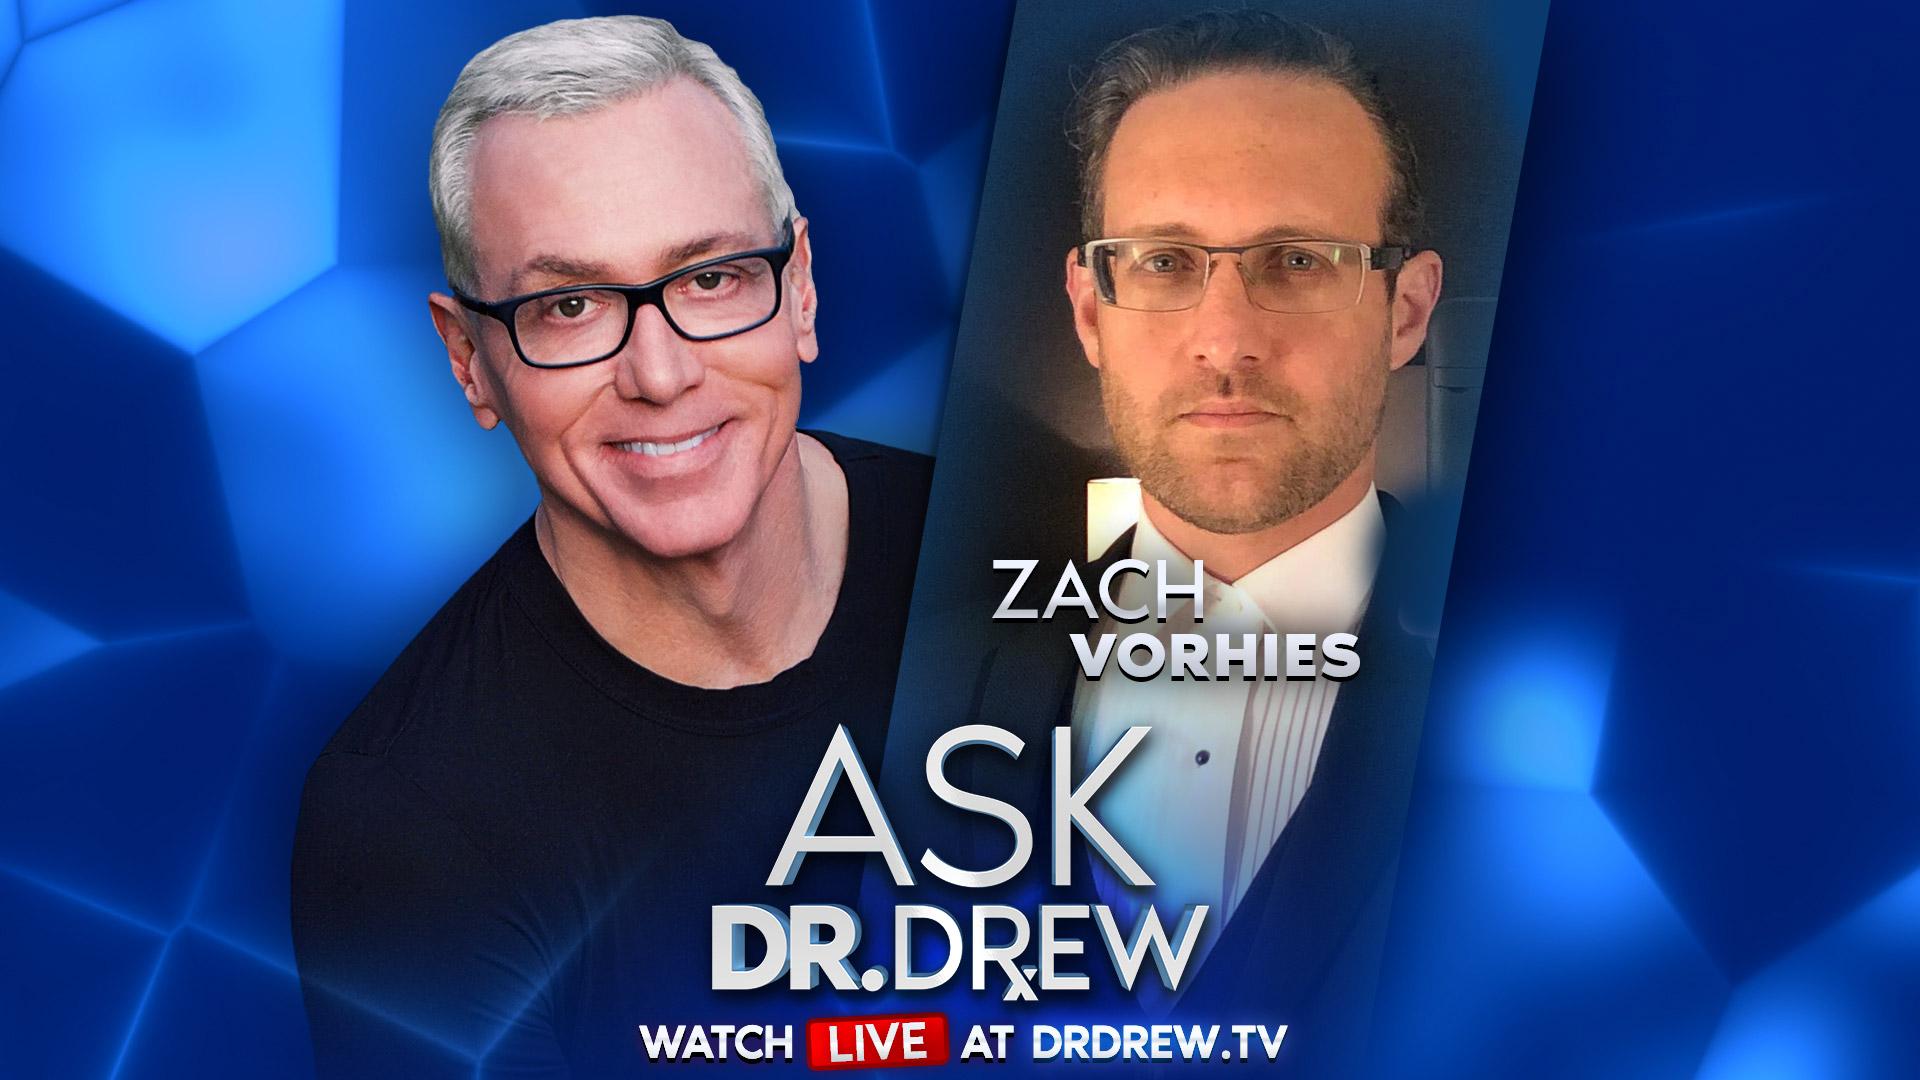 Google Leaks: Zach Vorhies Exposes Censorship & Bias By Big Tech – Ask Dr. Drew